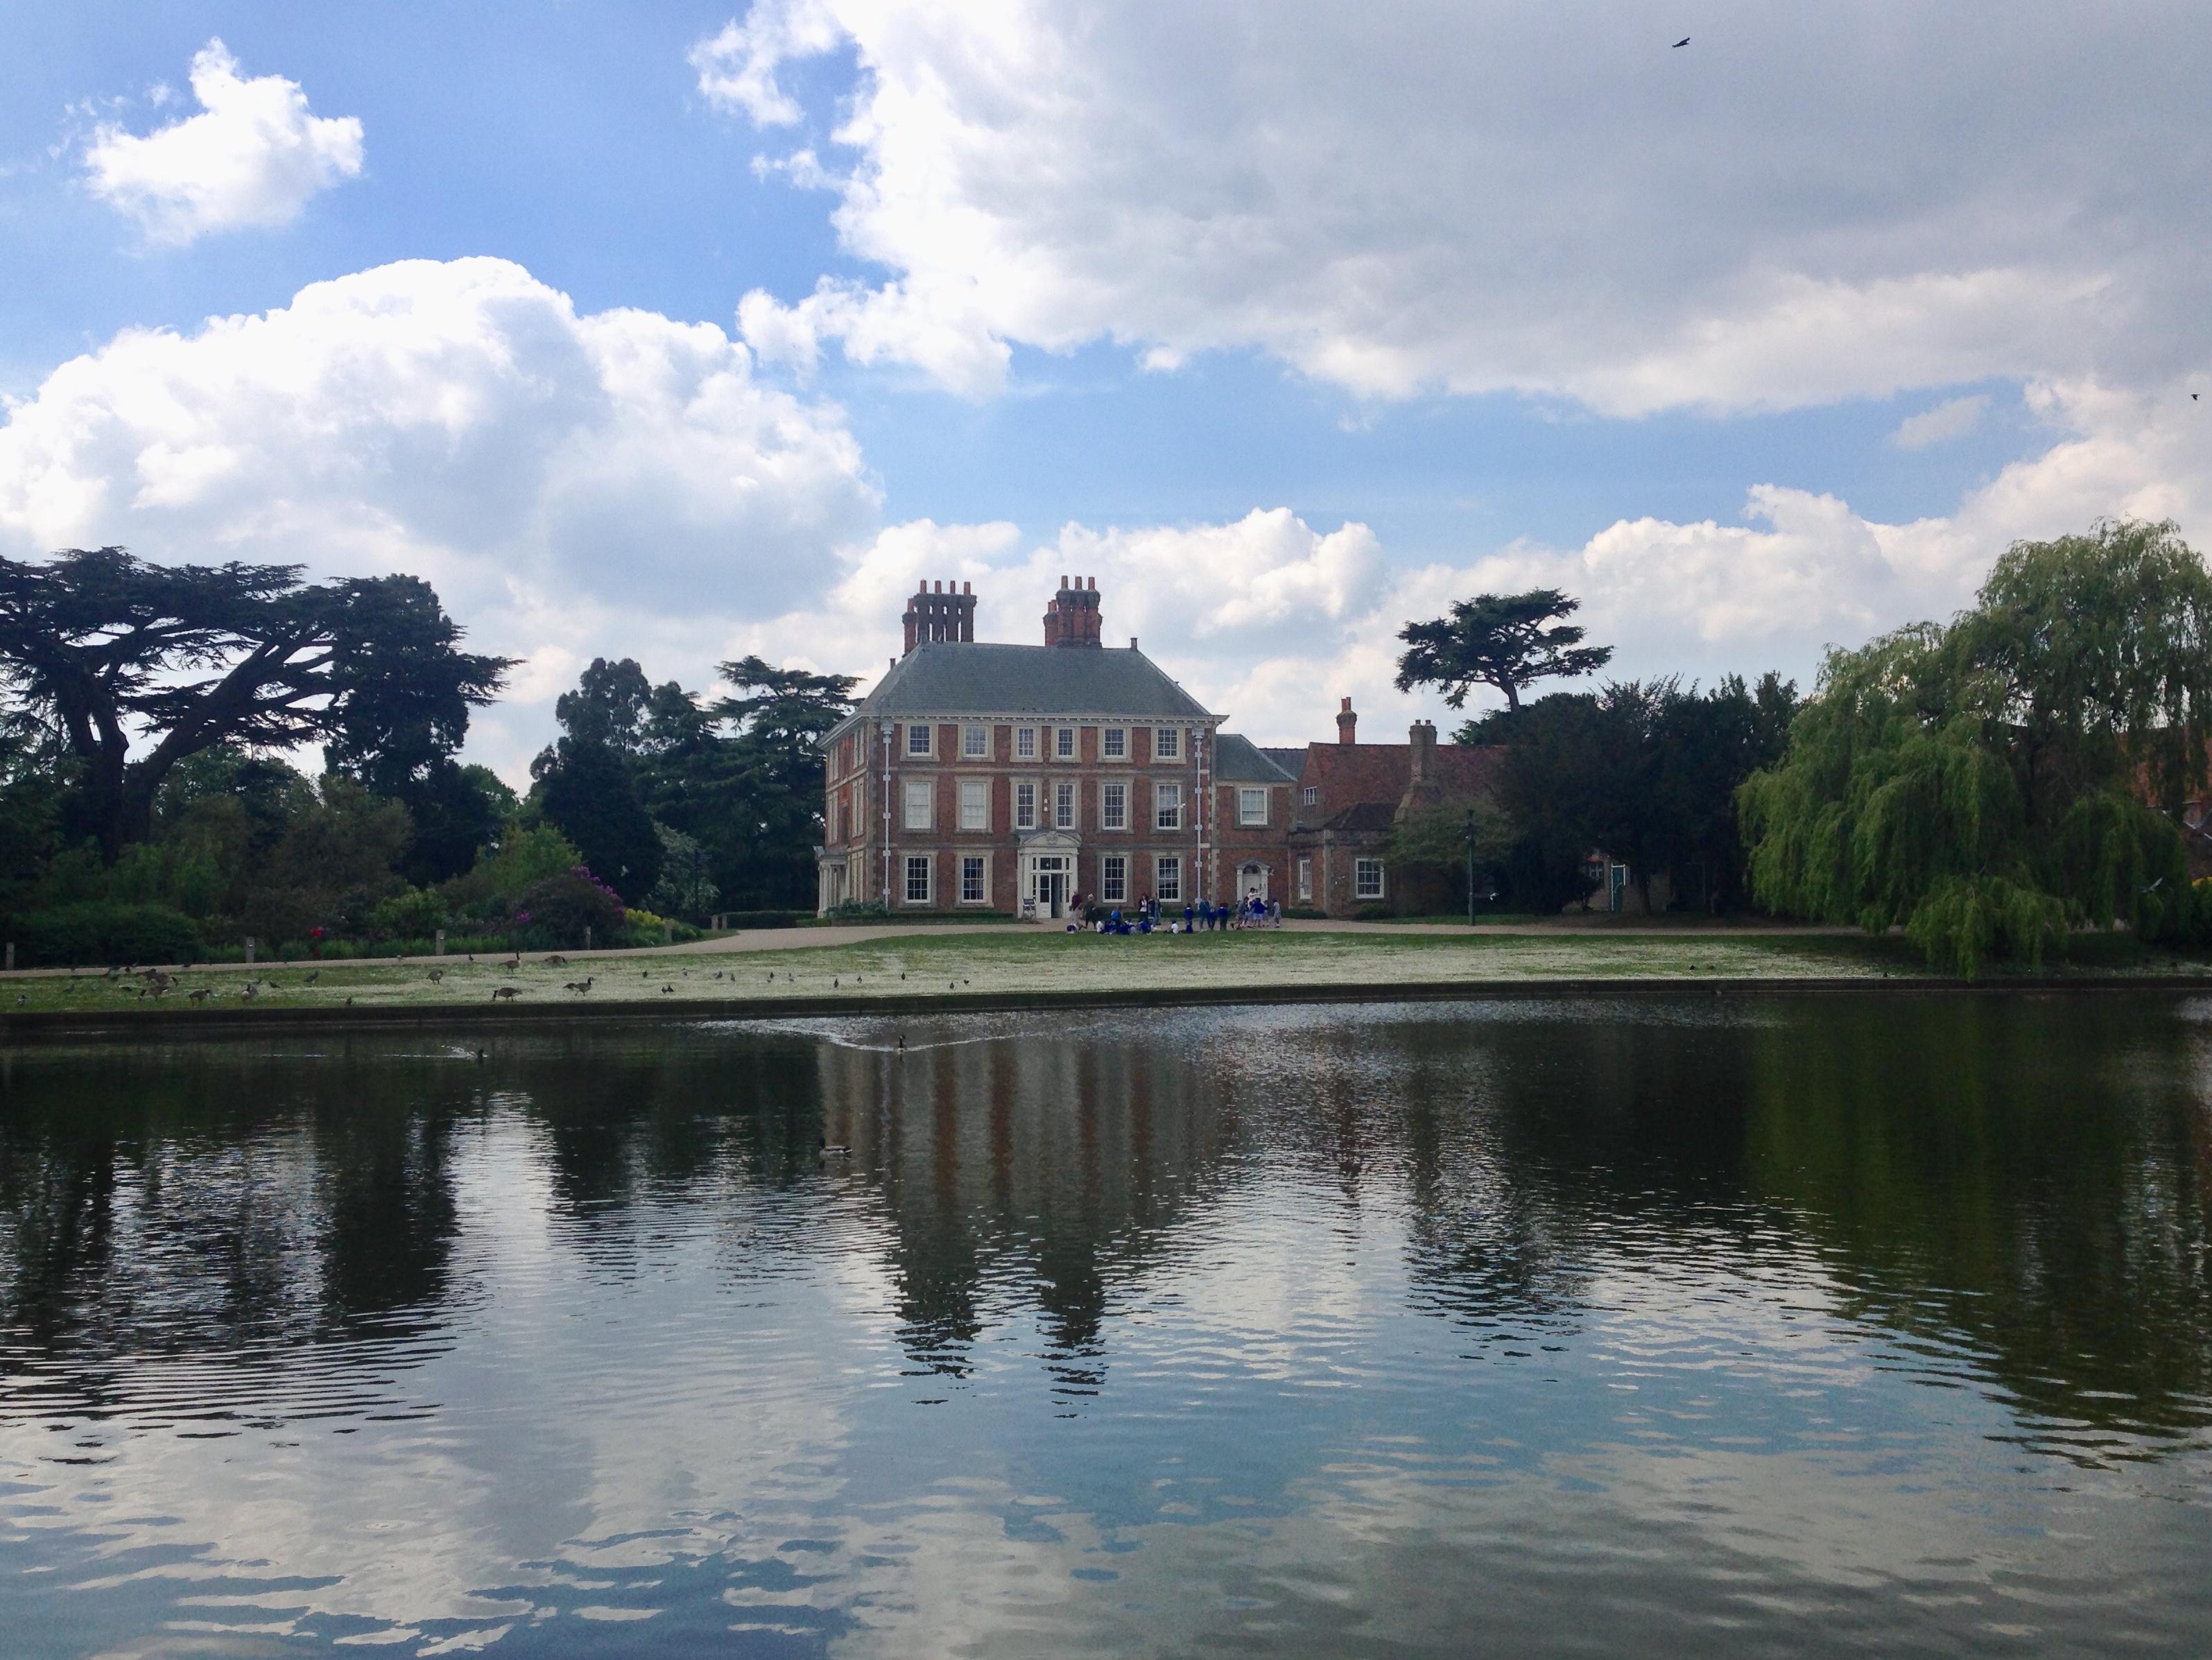 Elsyng Palace, Forty Hall, Myddelton House